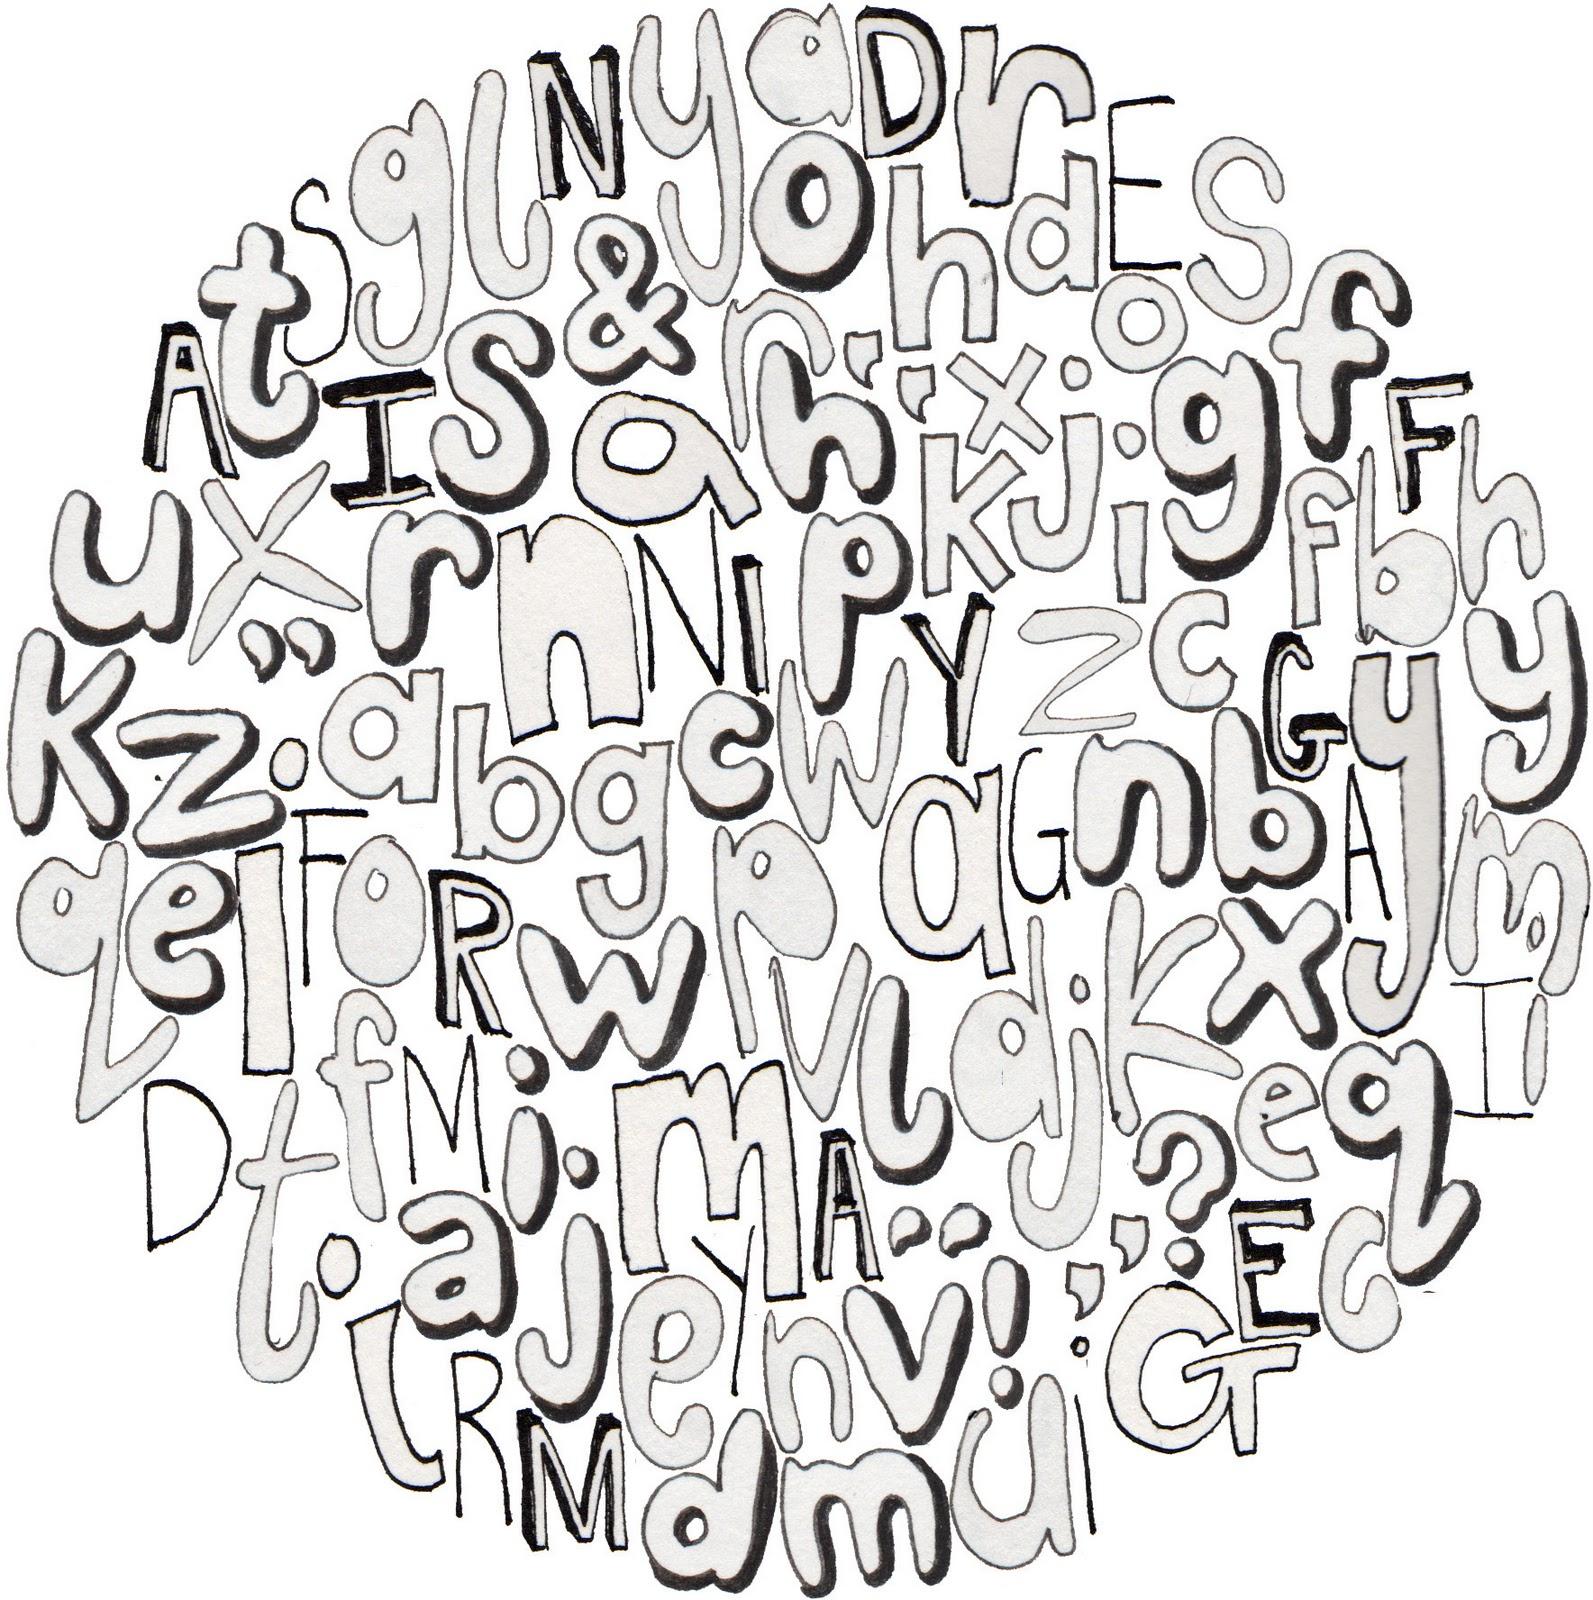 rebecca louise illustrator   u00a9 random letters